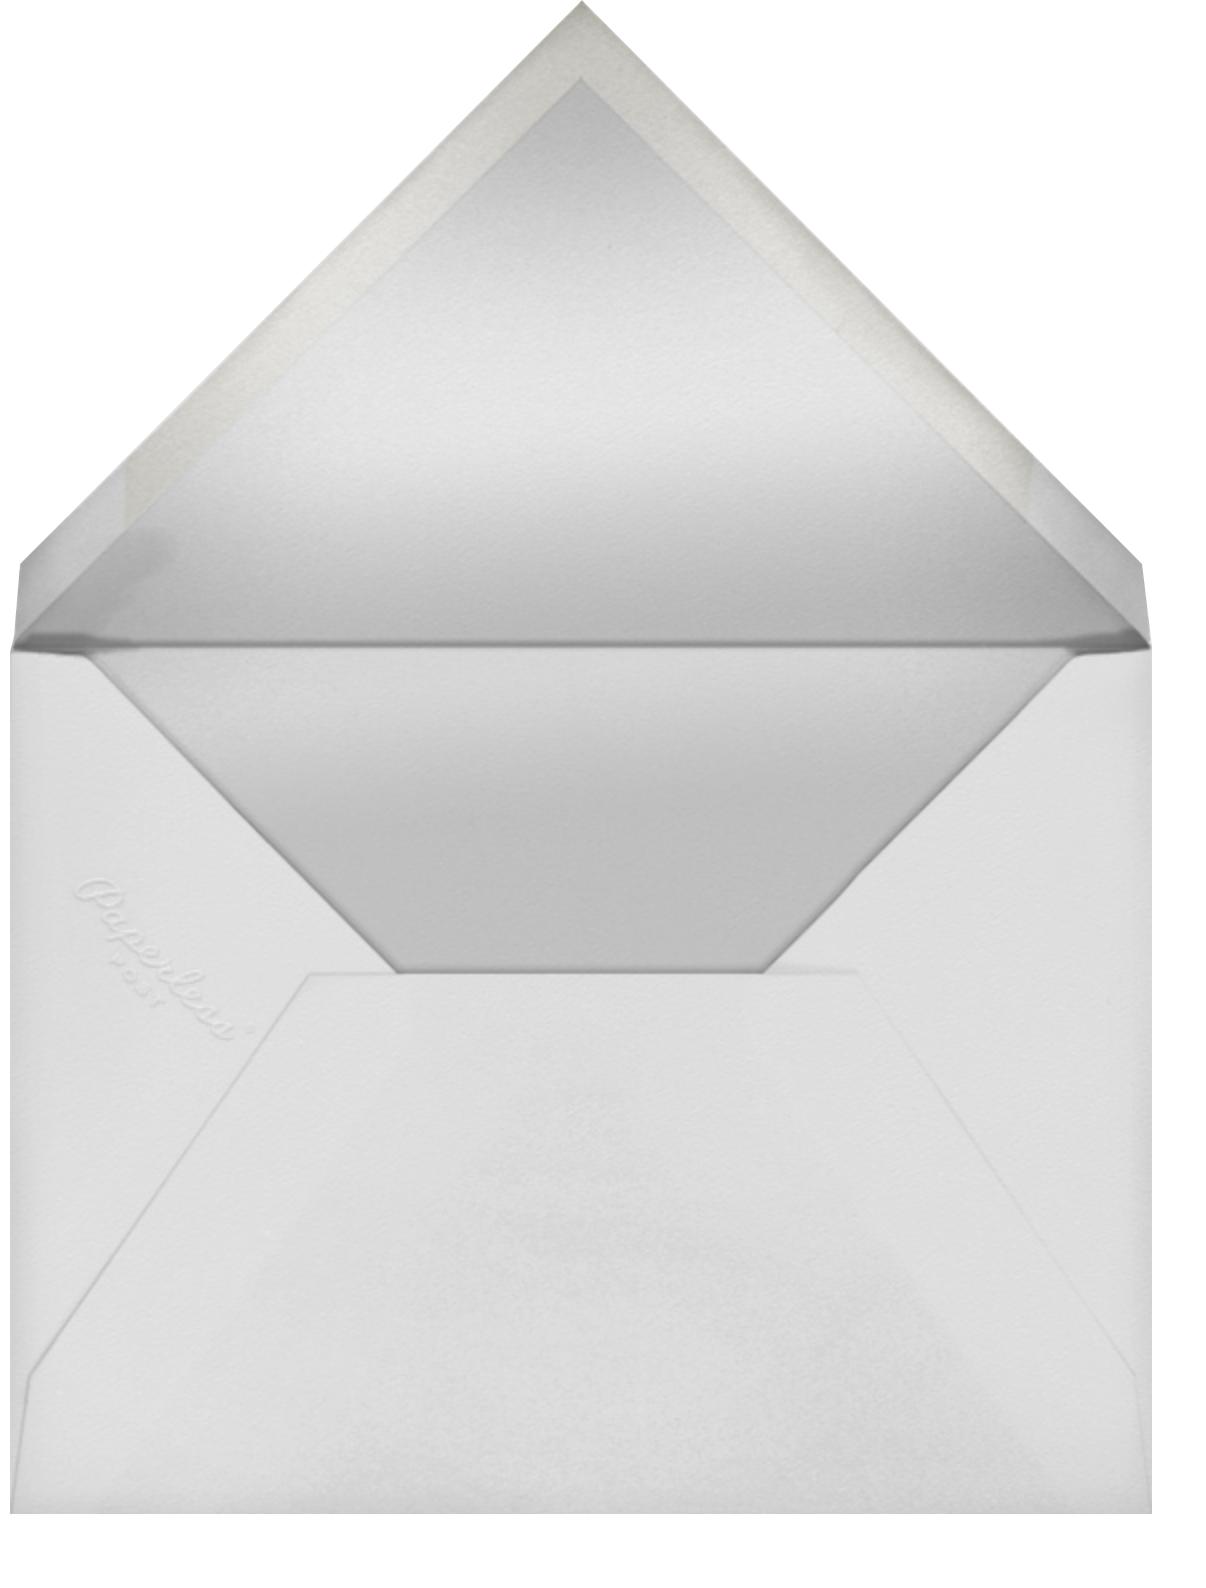 Paris Skyline View (Menu) - White/Black - Paperless Post - Menus - envelope back